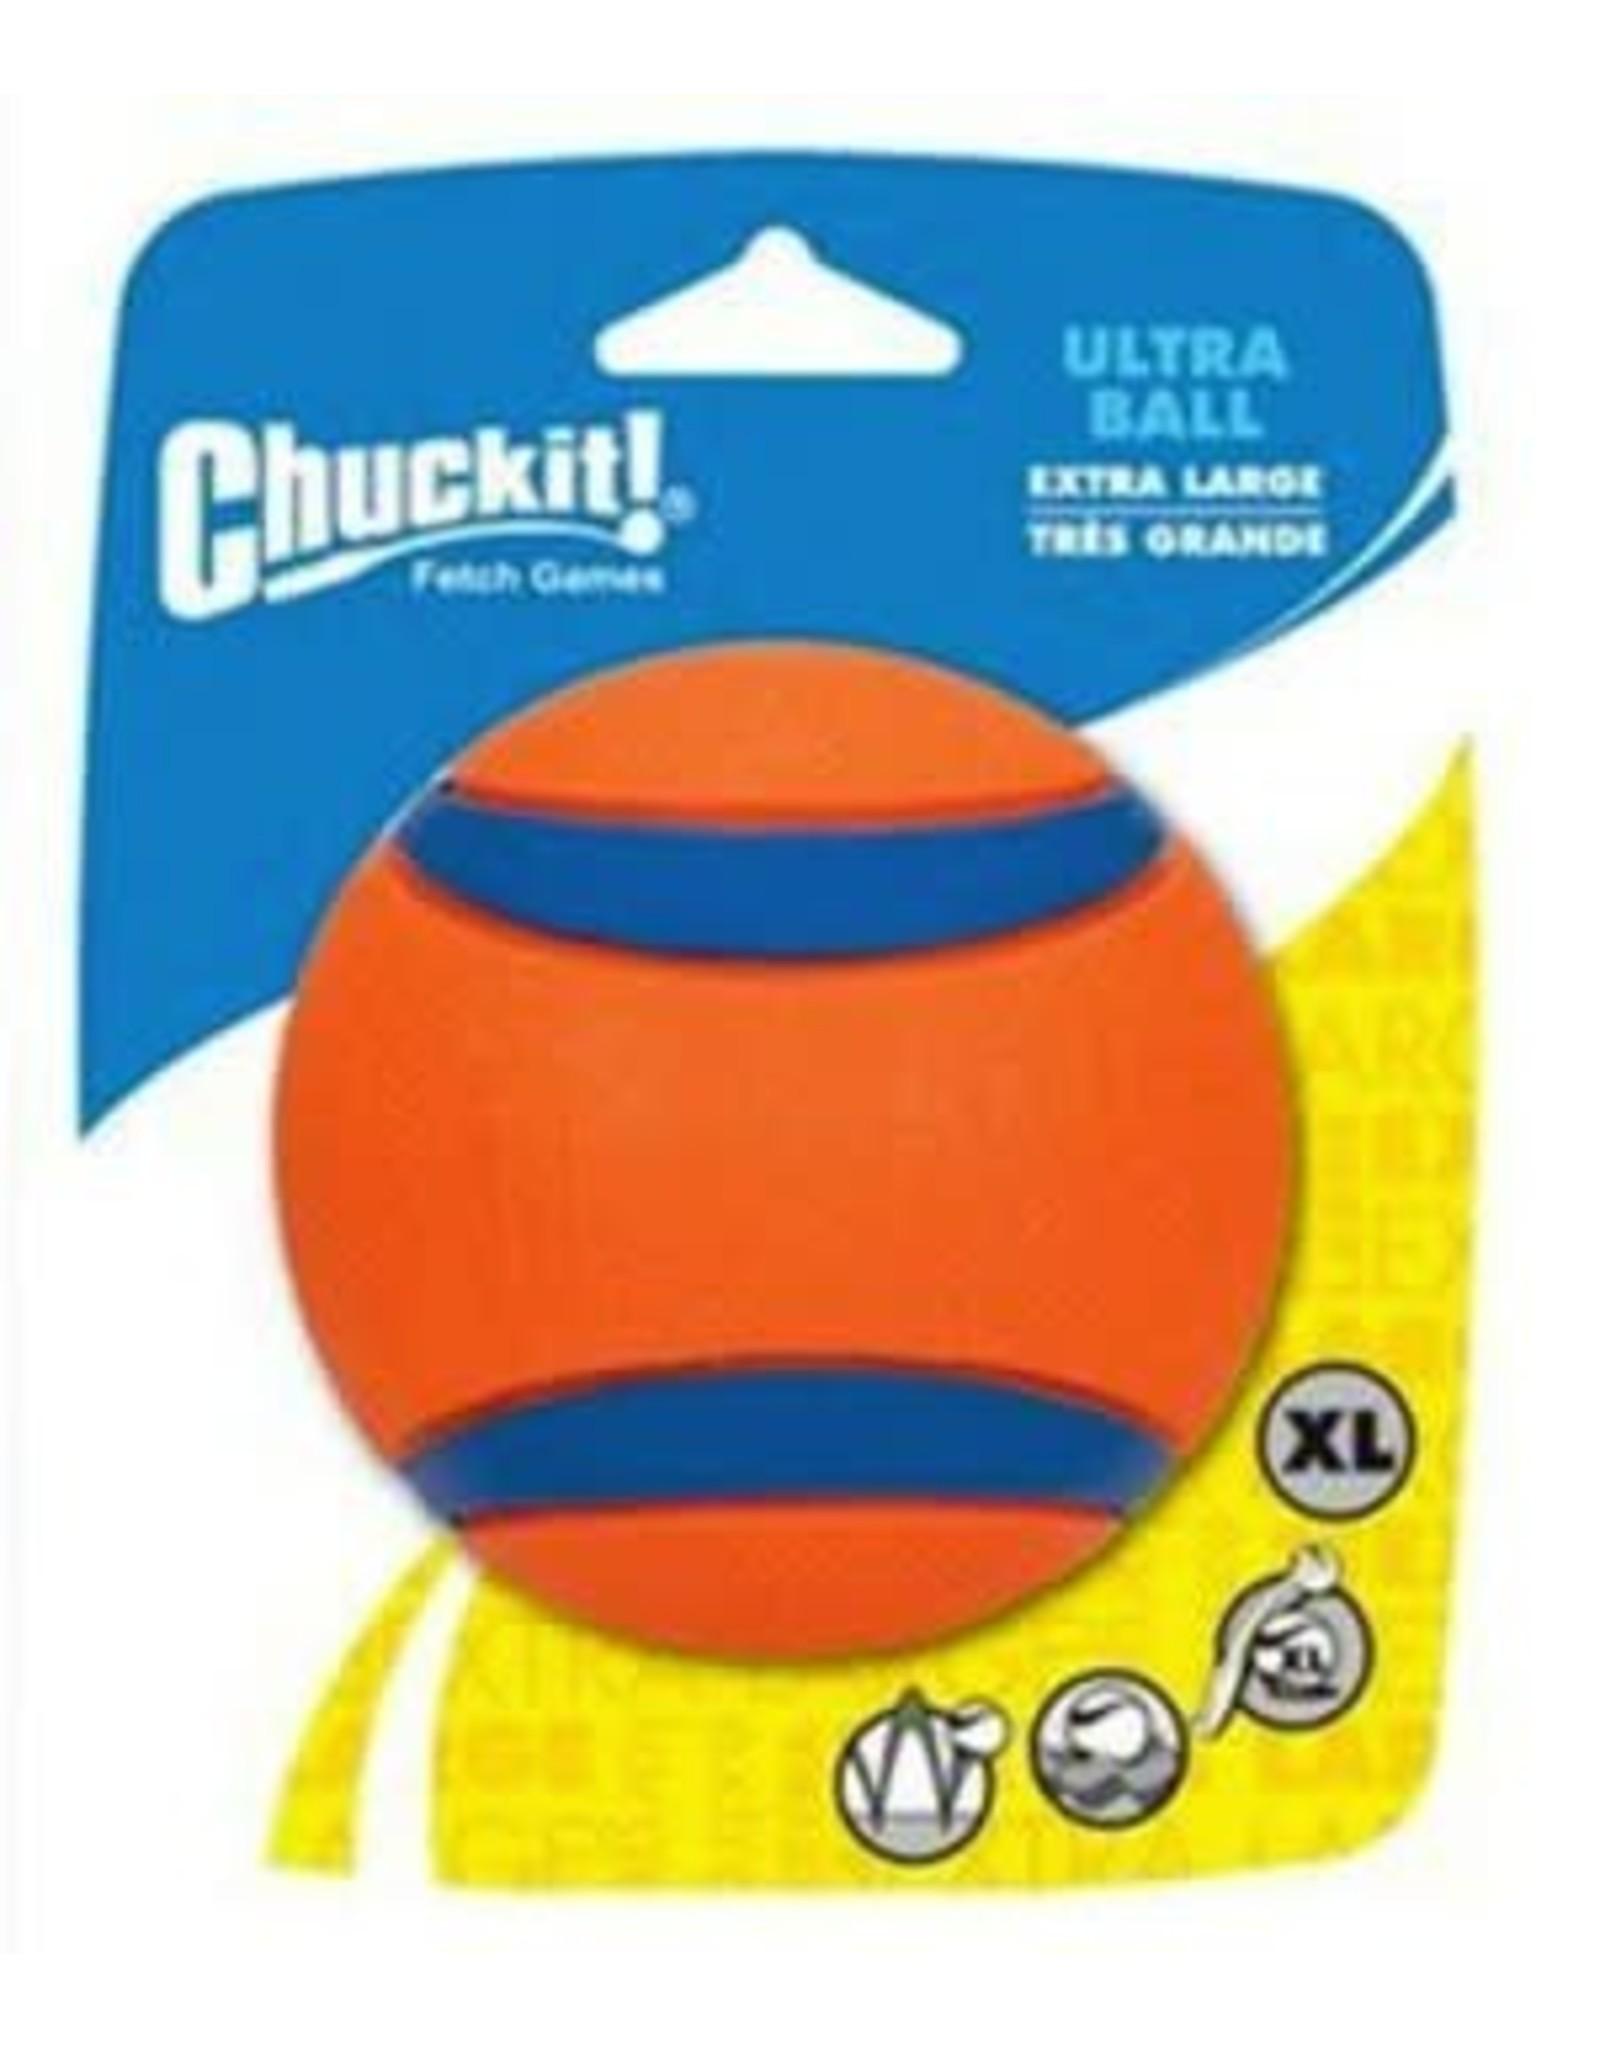 Chuckit Ultra Ball Extra Dog Toy, Large 9cm